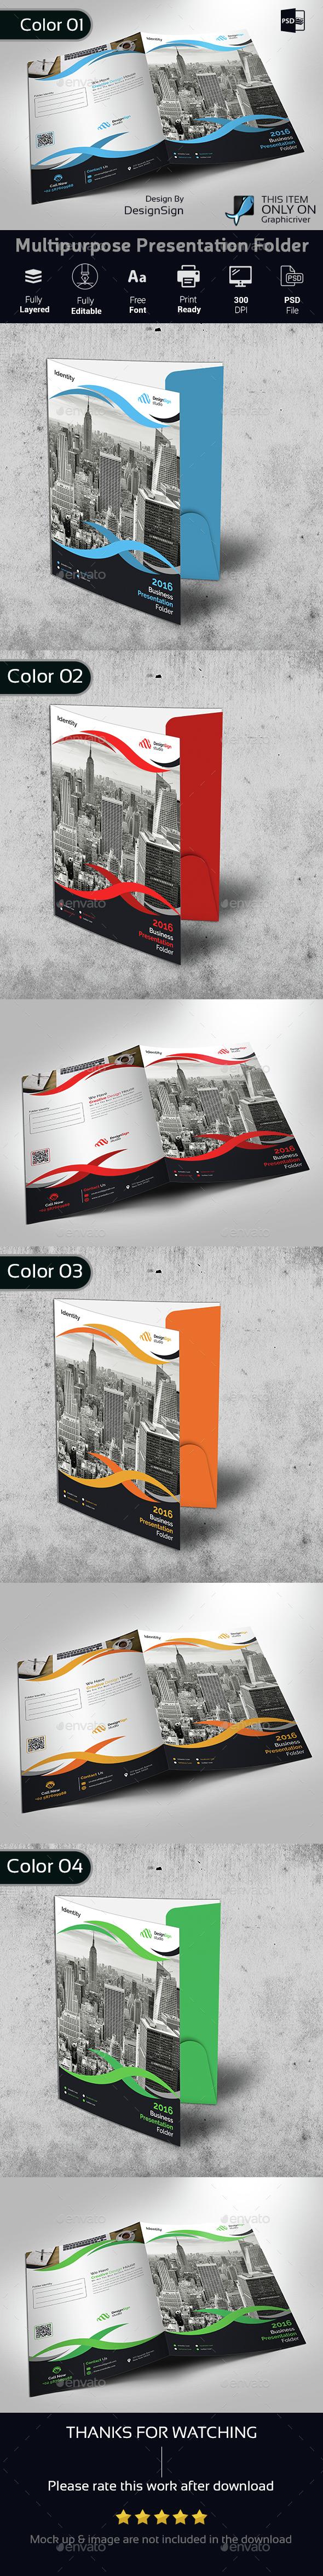 Multipurpose Business Presentation Folder - Stationery Print Templates